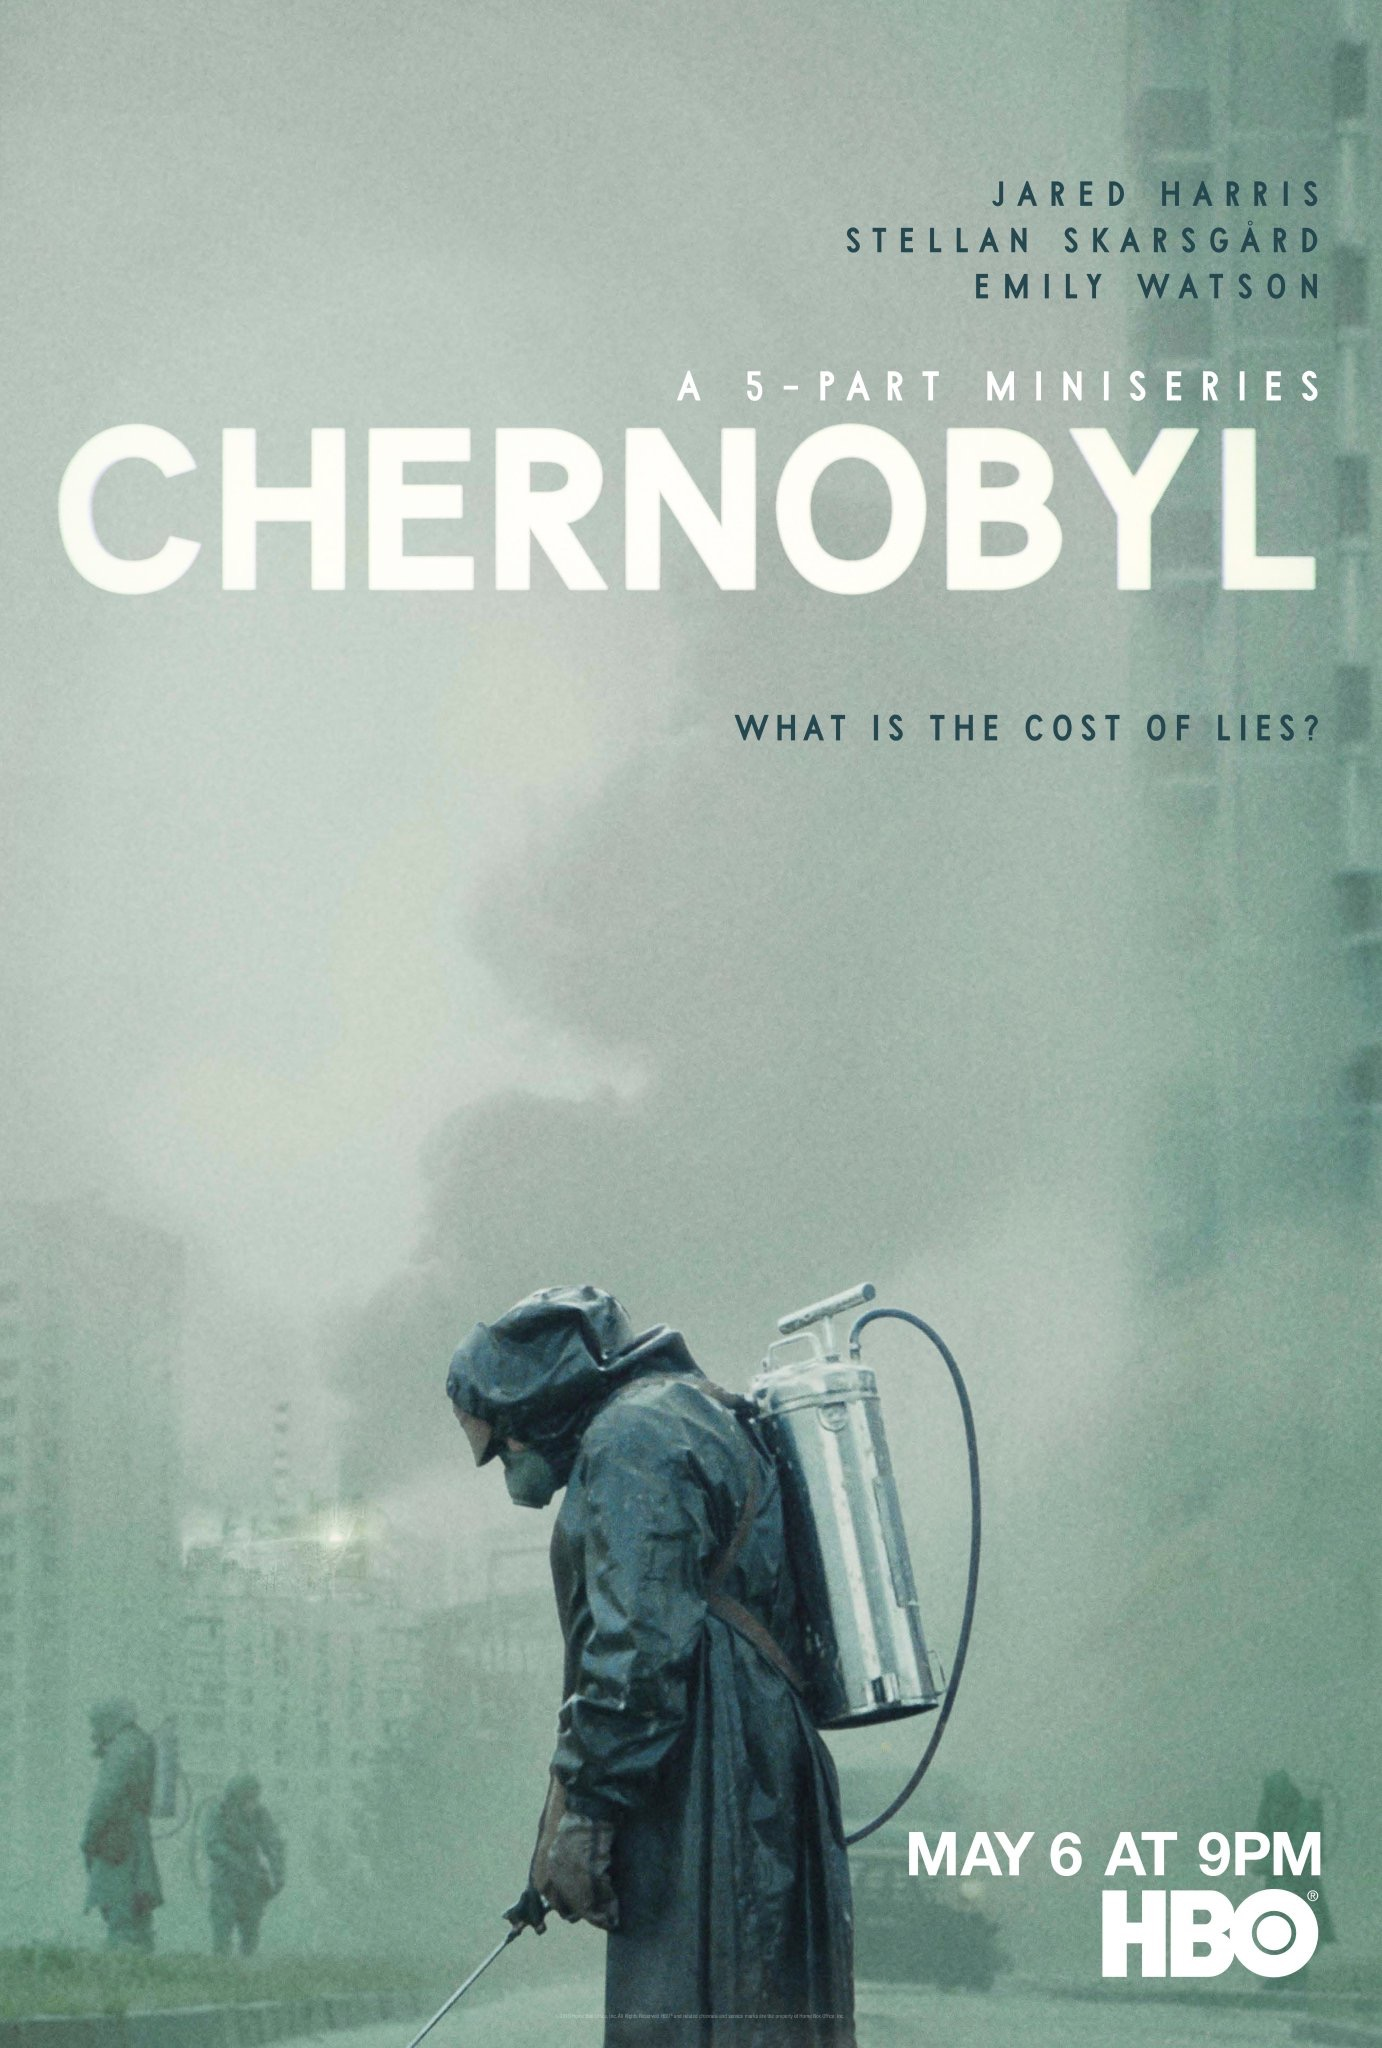 Chernobyl poster.jpg